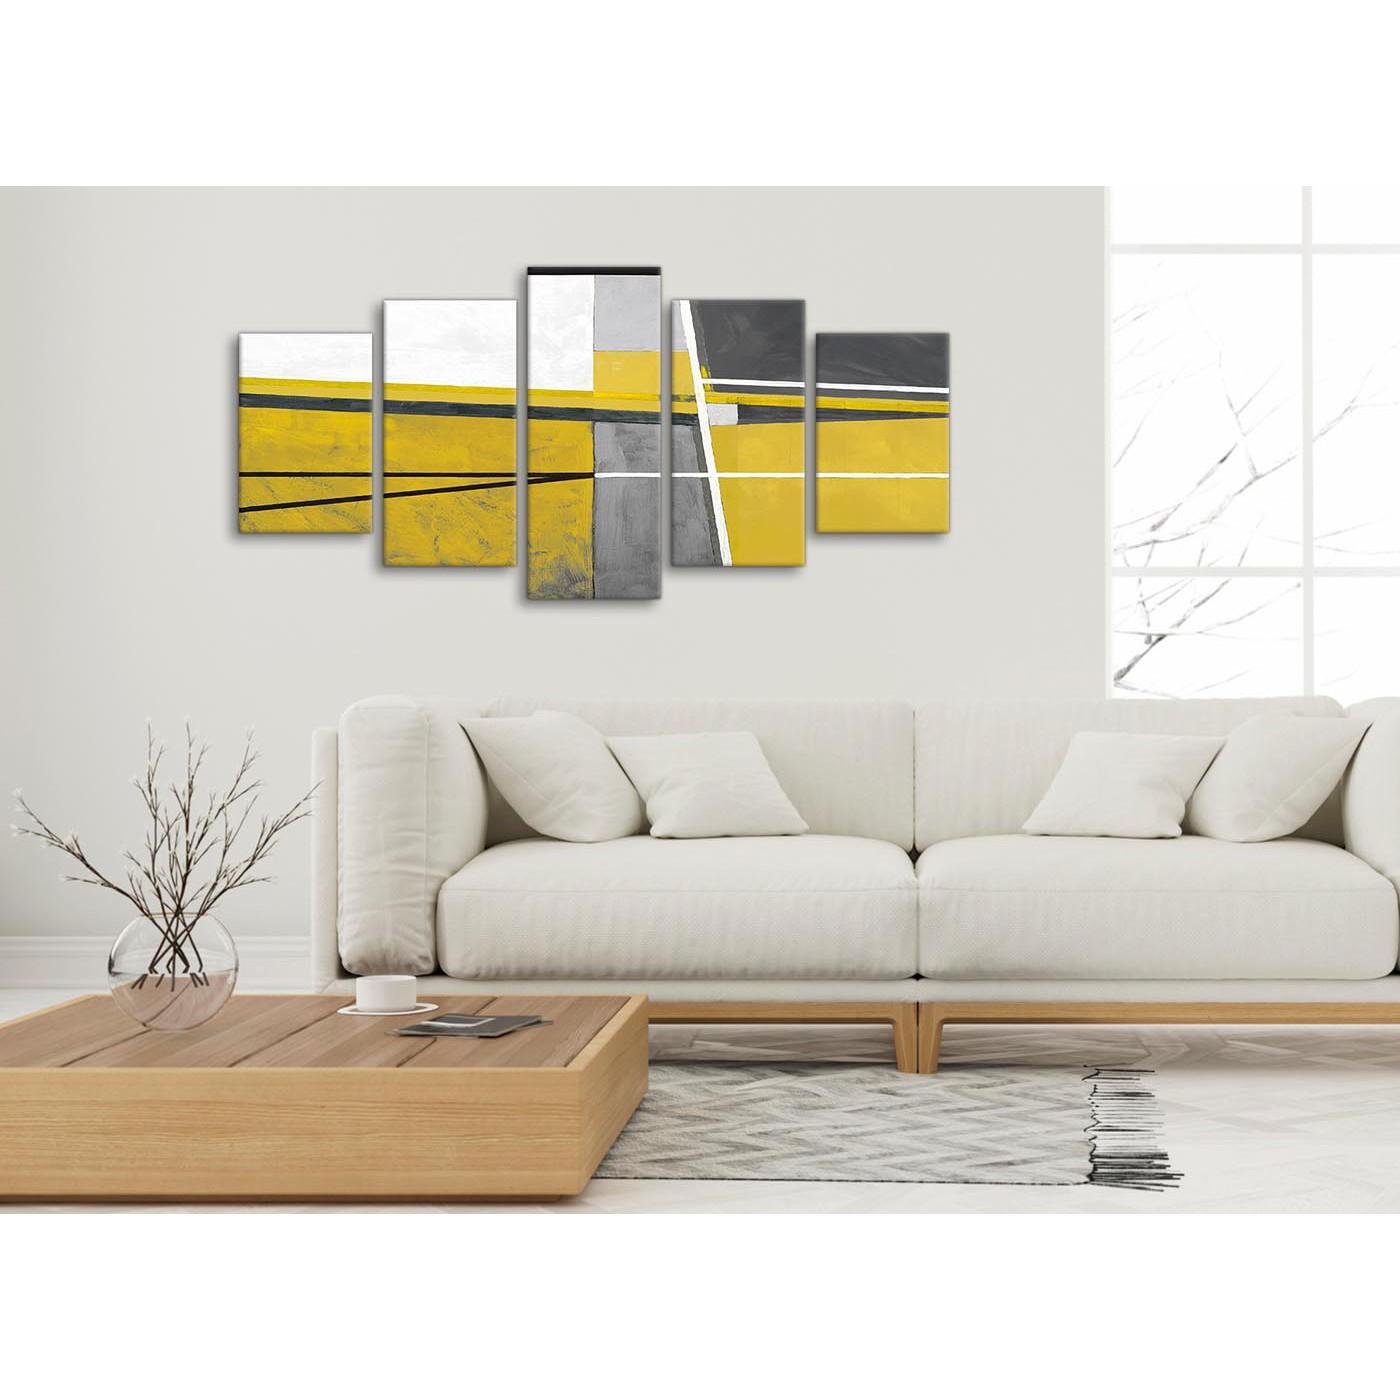 Bedroom Canvas Wall Art Uk: 5 Panel Mustard Yellow Grey Painting Abstract Bedroom